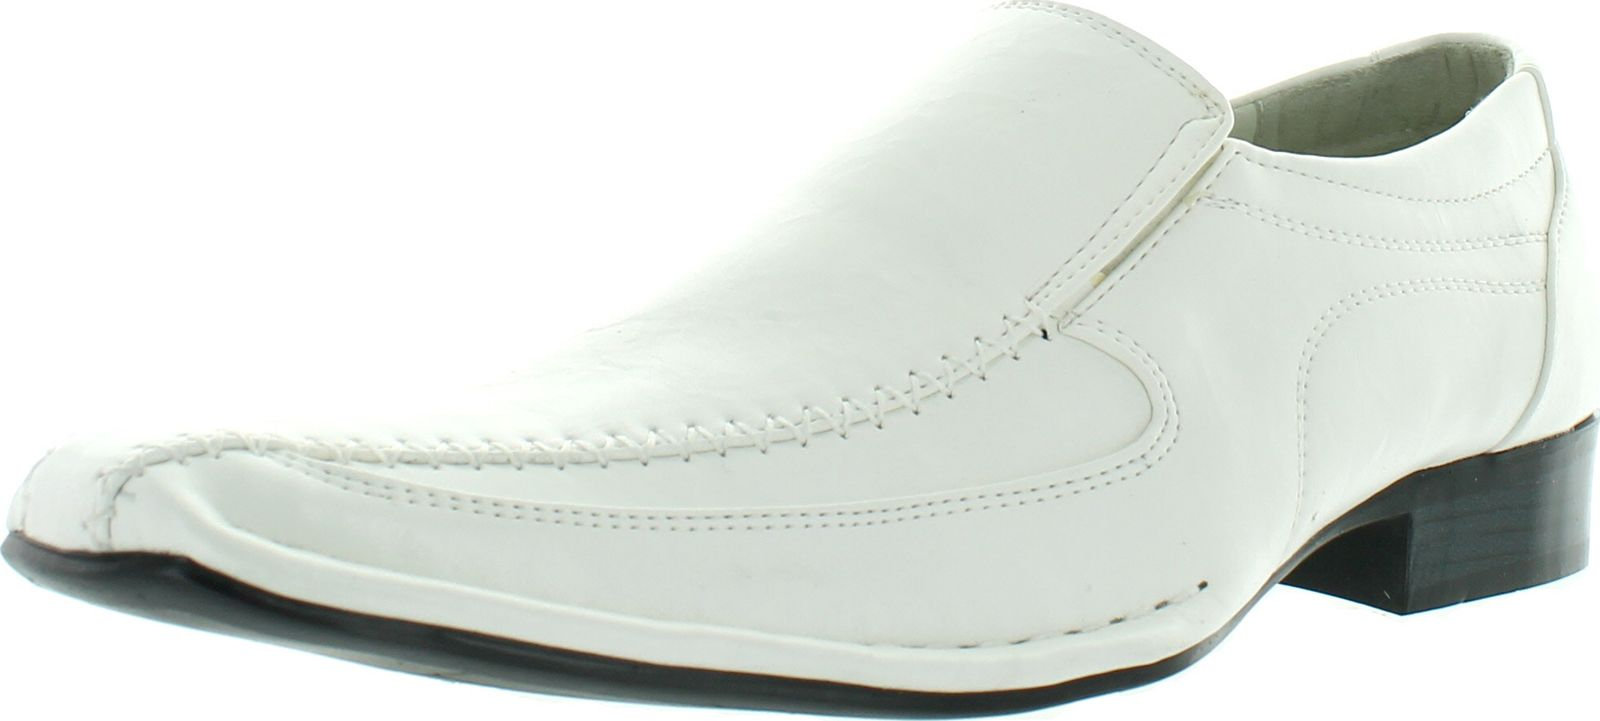 alberto fellini nedu01 dress loafers slip on lace up